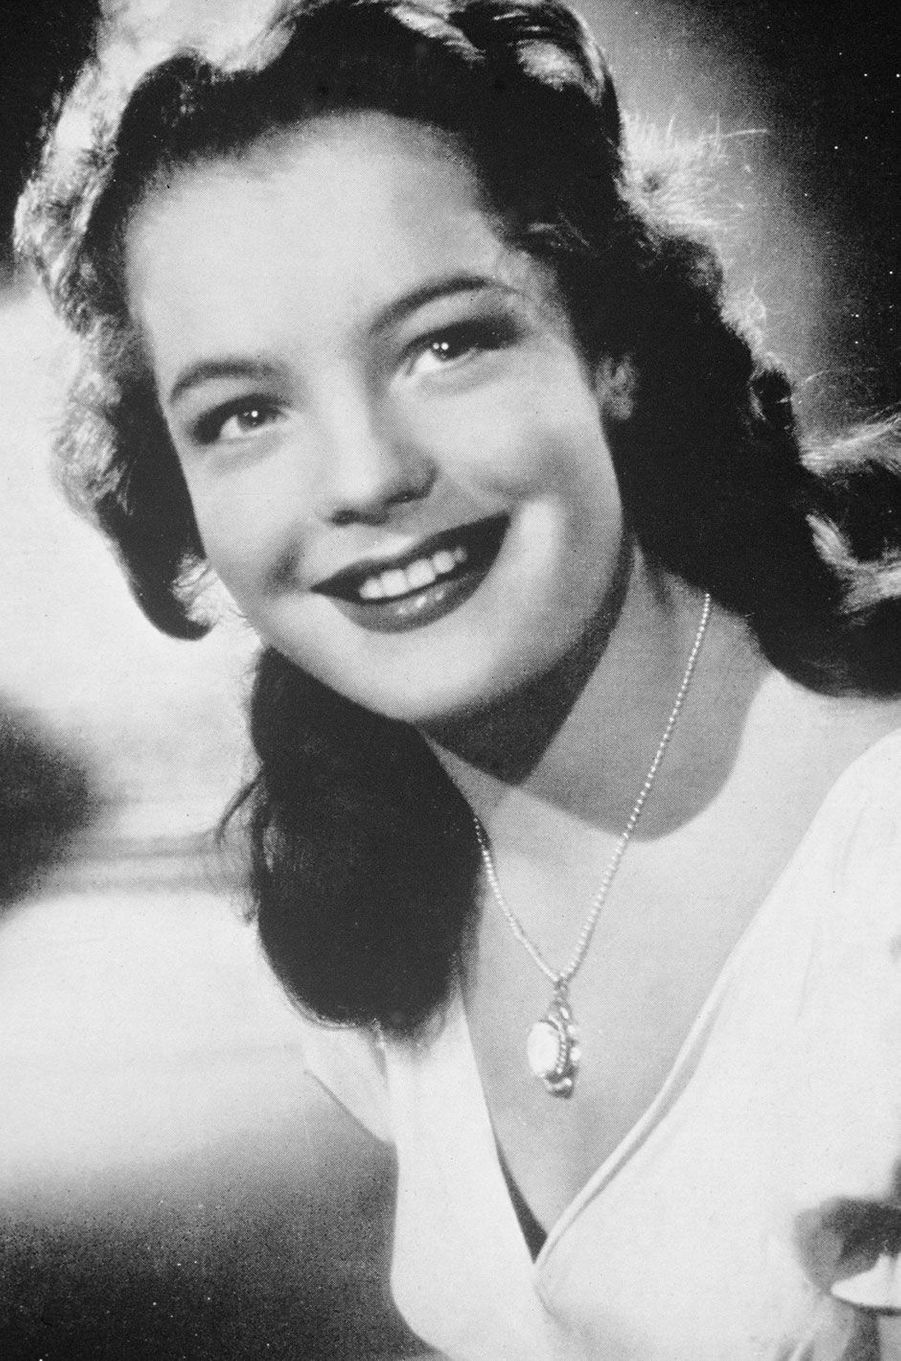 Romy Schneider dans les années 50